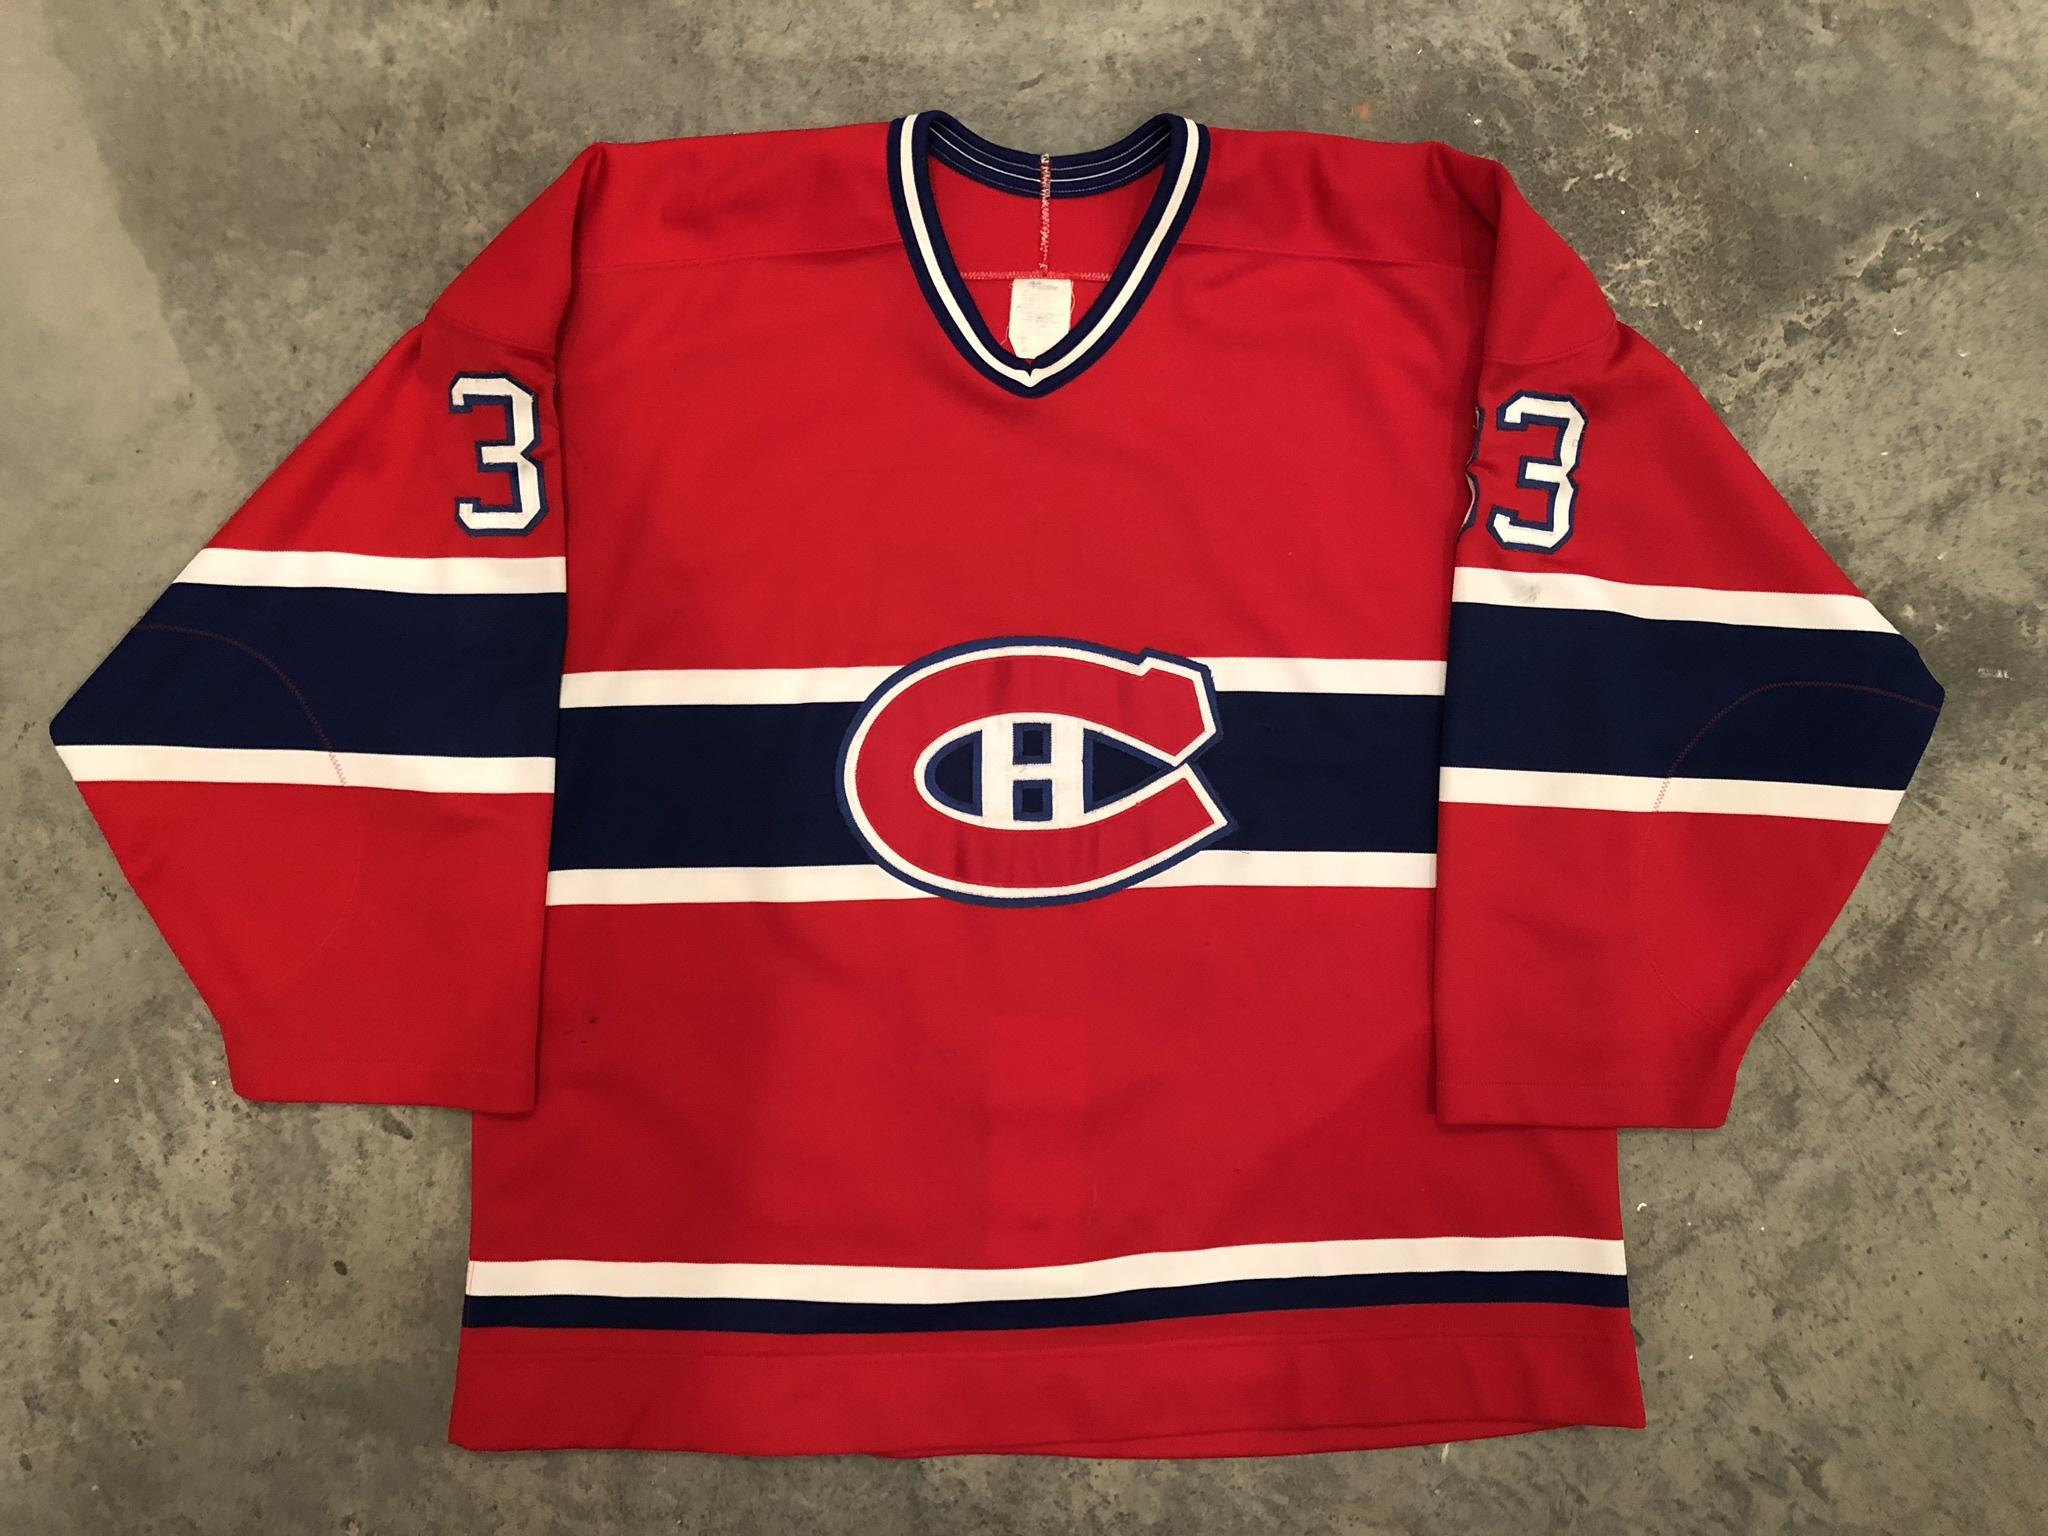 Patrick Roy Montreal Canadiens Game Worn Jersey - 1989, 1990 & 1992 Vezina Winner